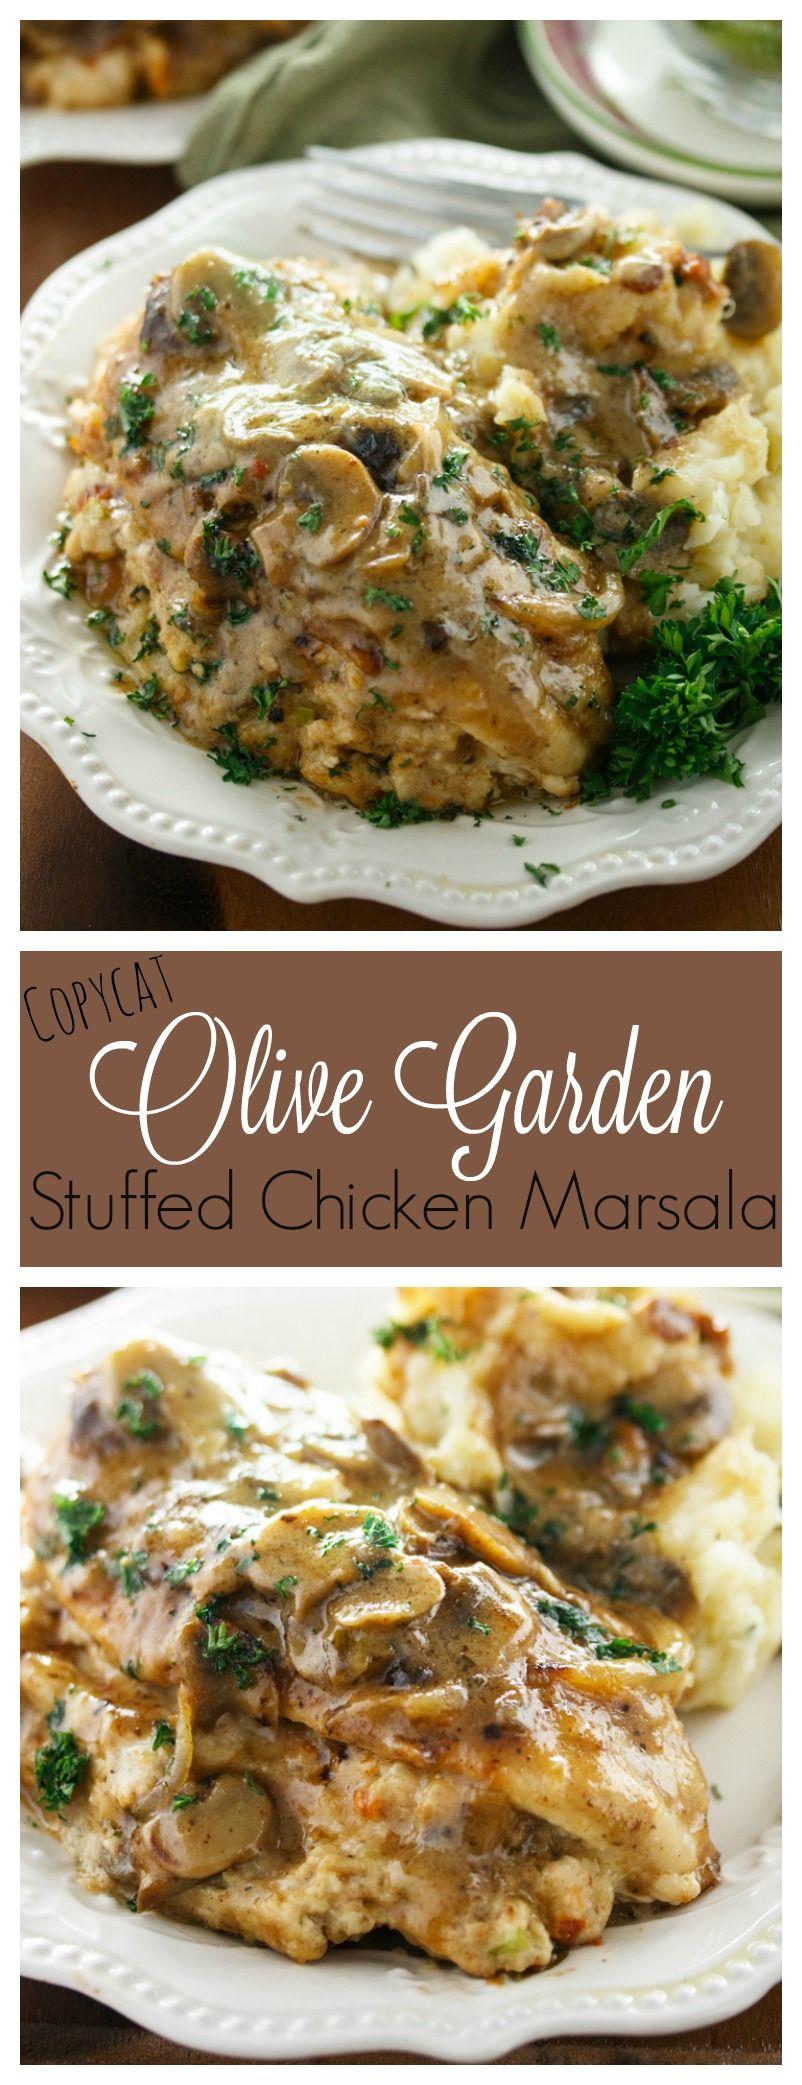 Copycat Olive Garden Stuffed Chicken Marsala Recipe Stuffed Chicken Marsala Chicken Marsala